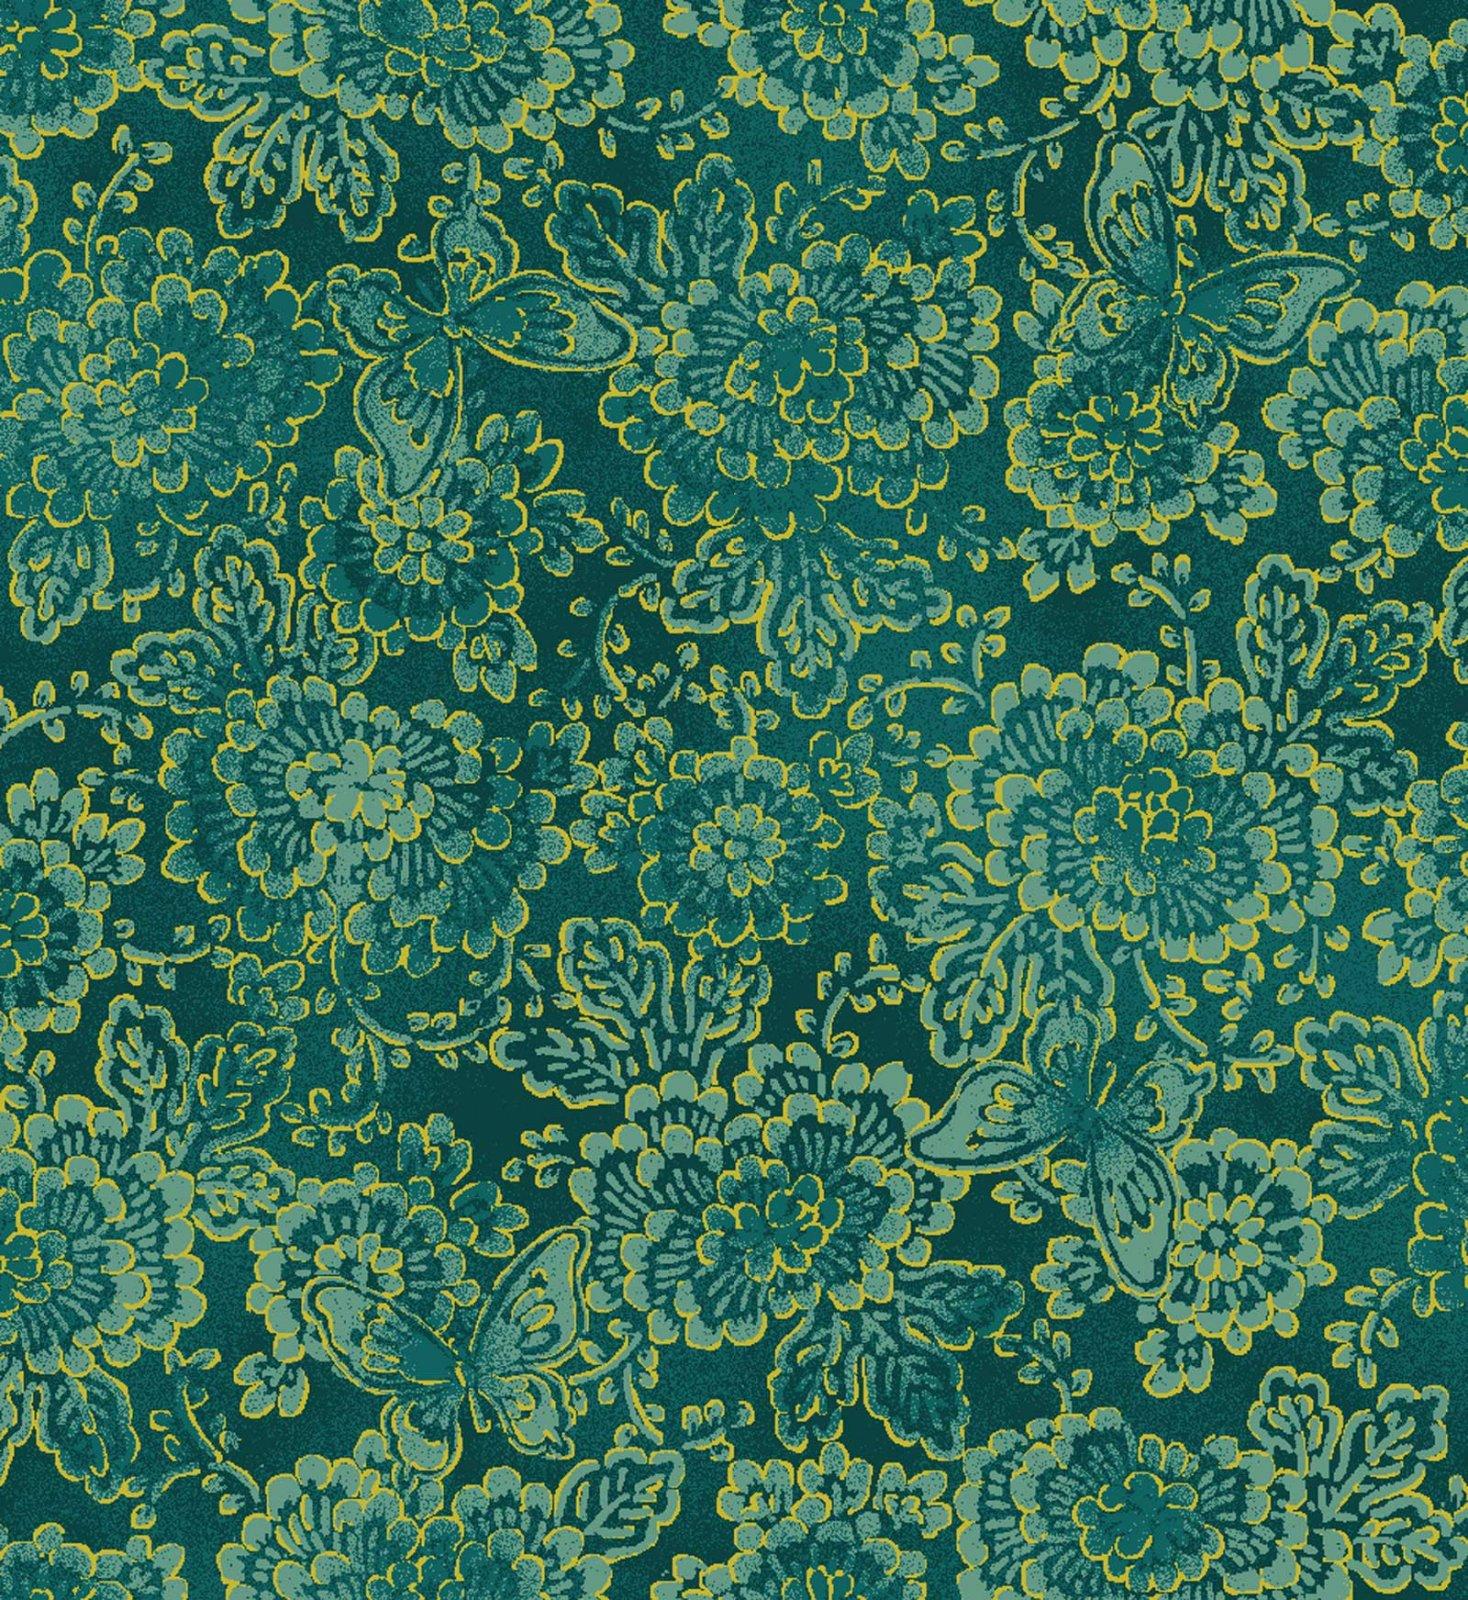 Asian Garden Teal Floral w/ metallic